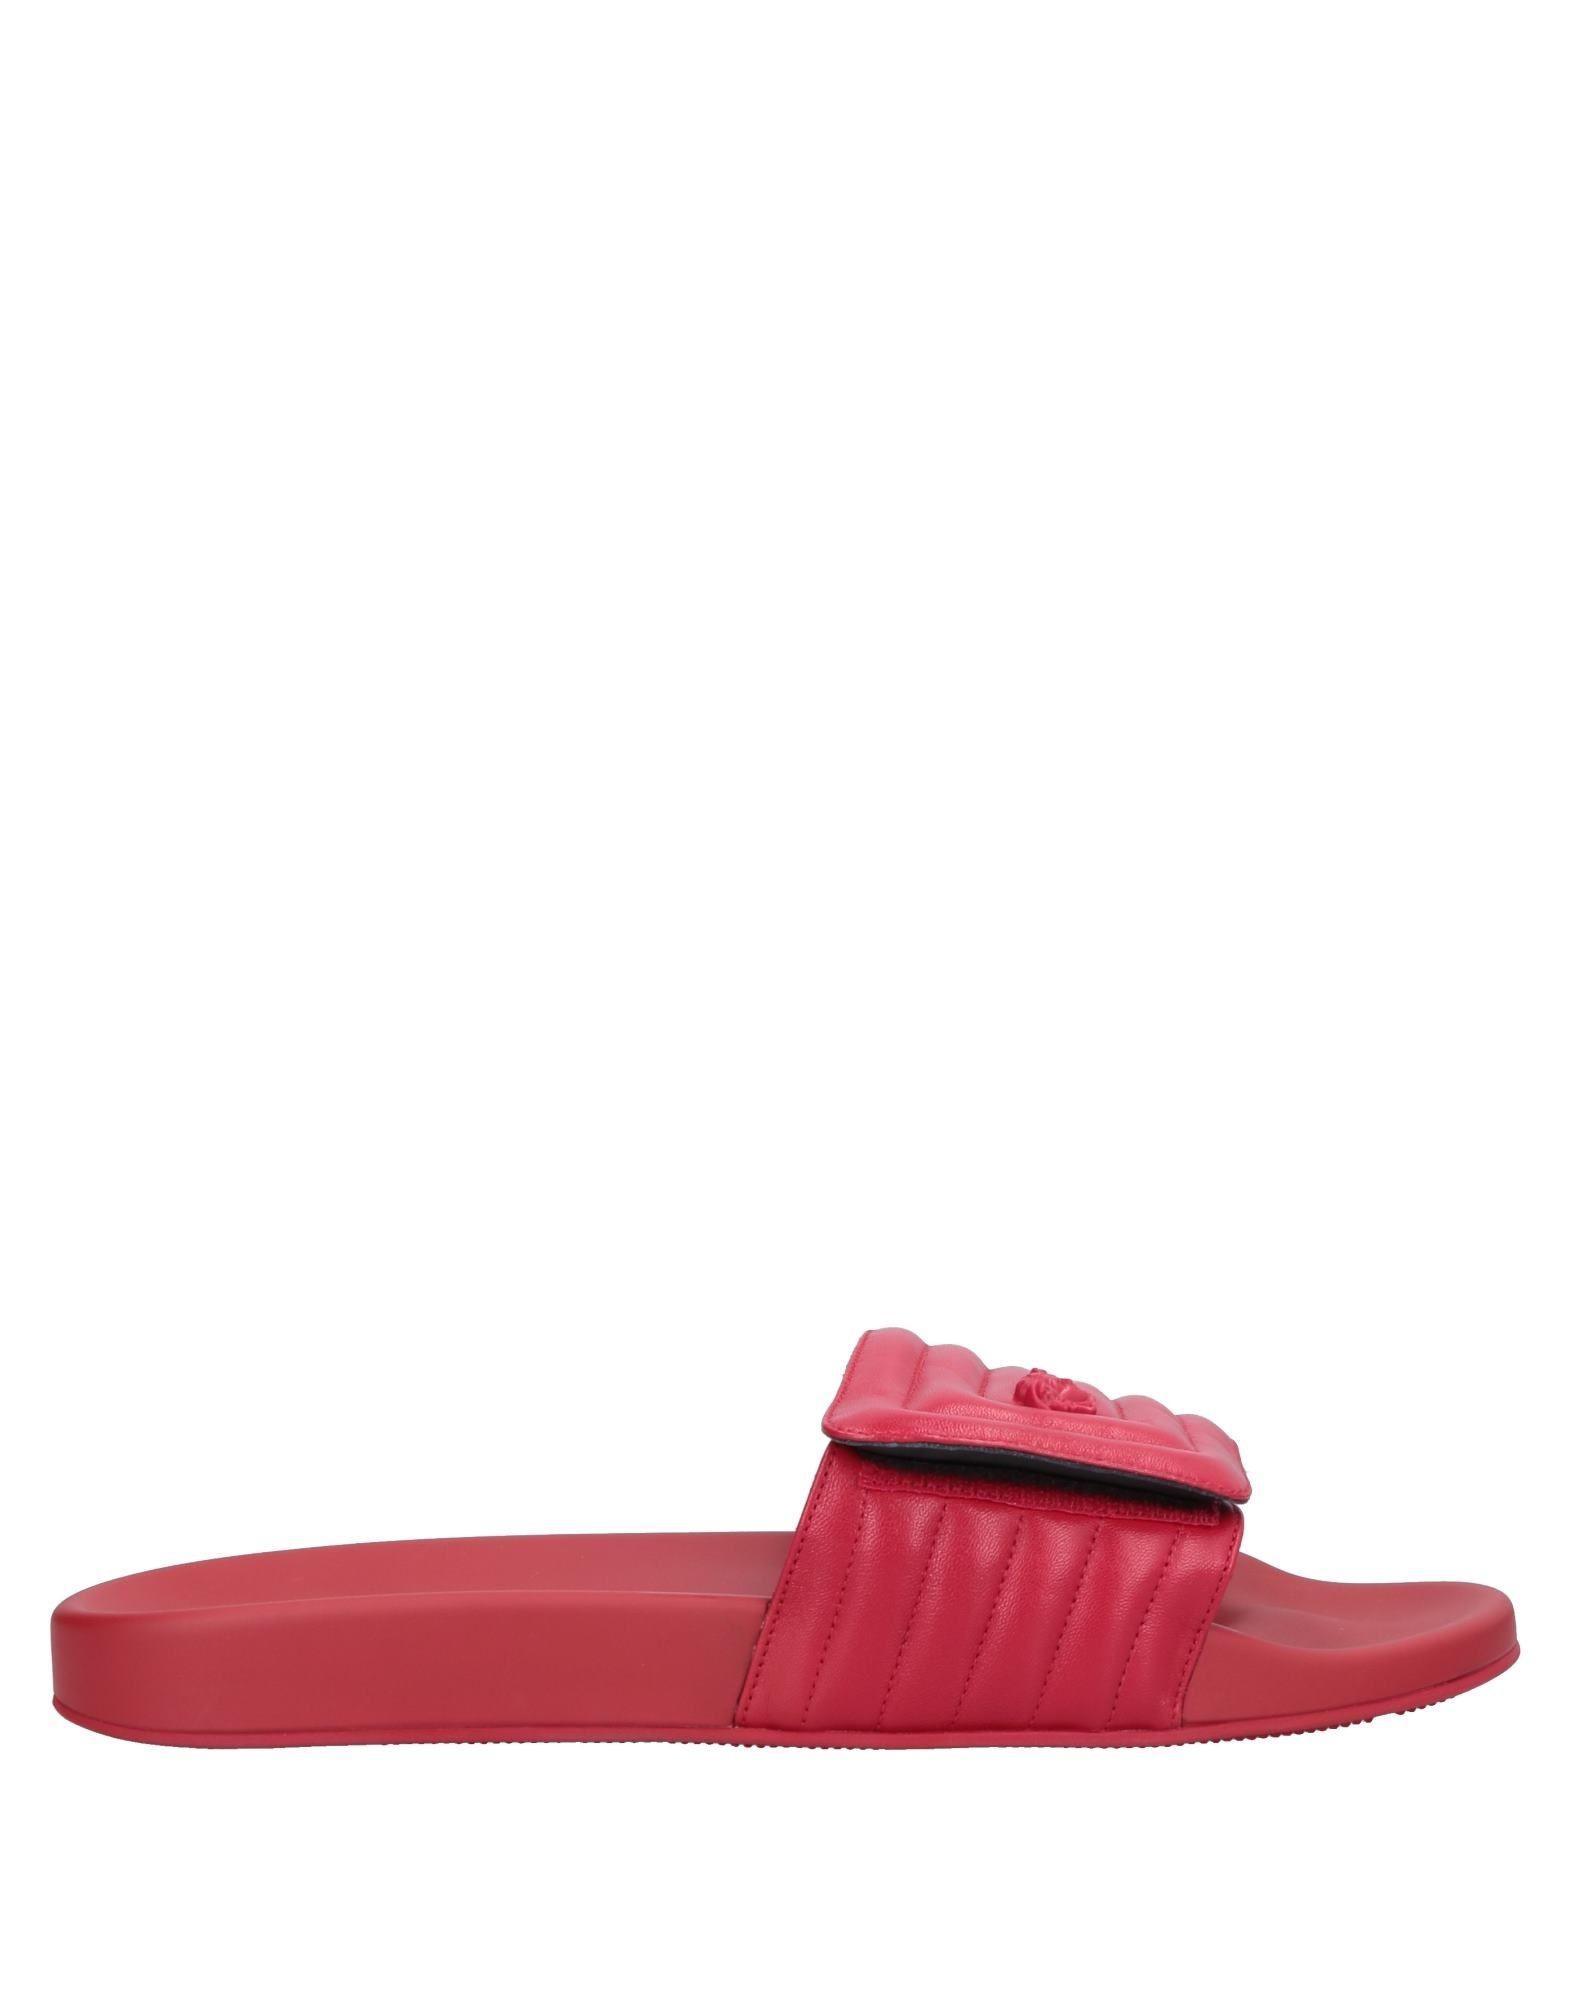 8c1af333c7ad Versace Sandals in Red for Men - Lyst